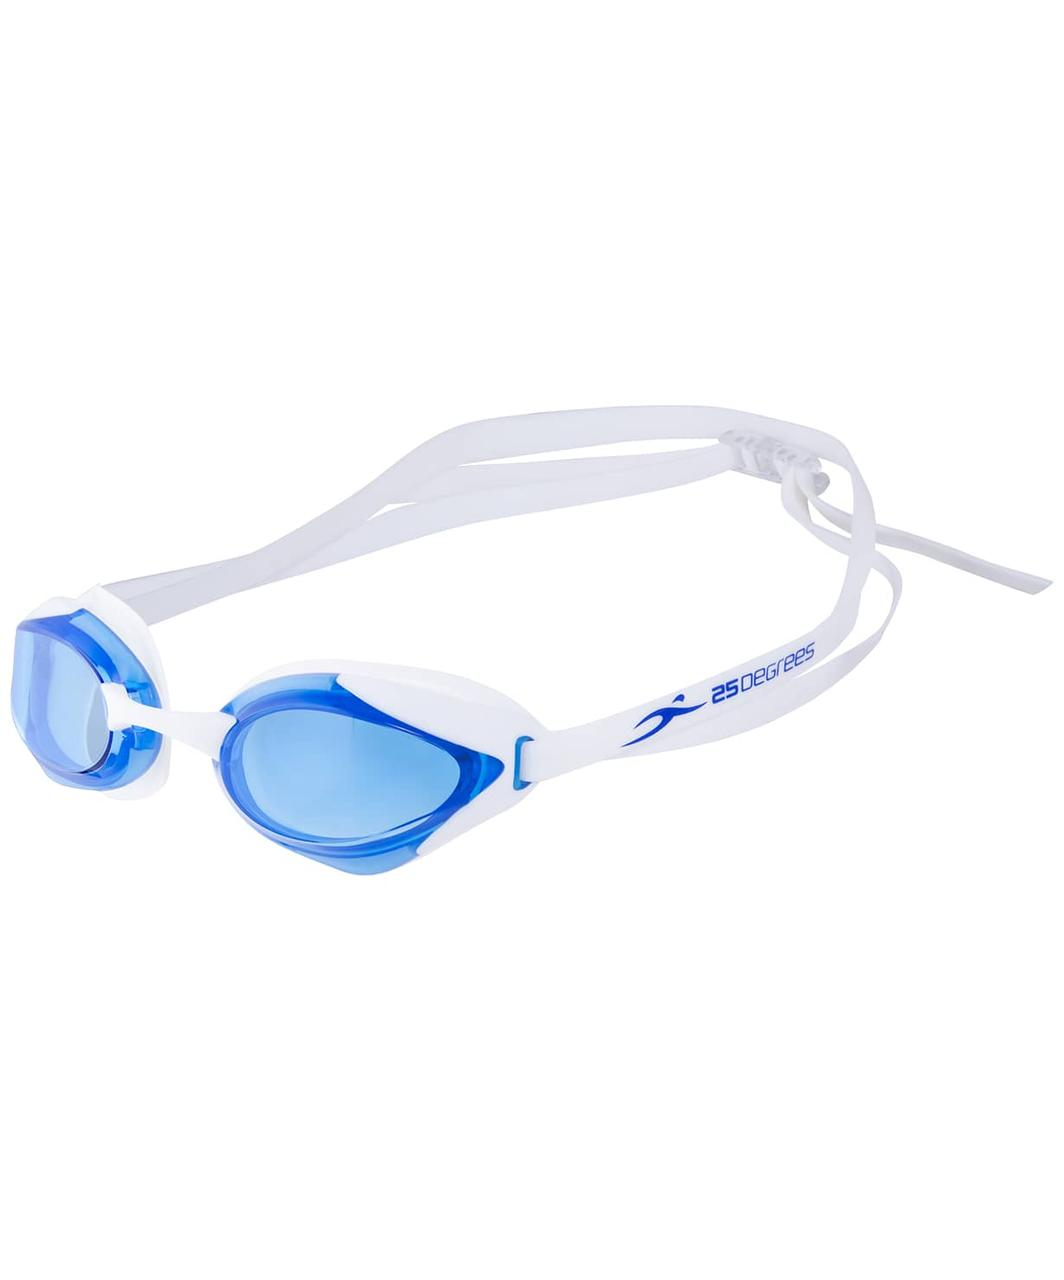 Очки для плавания Infase White 25Degrees